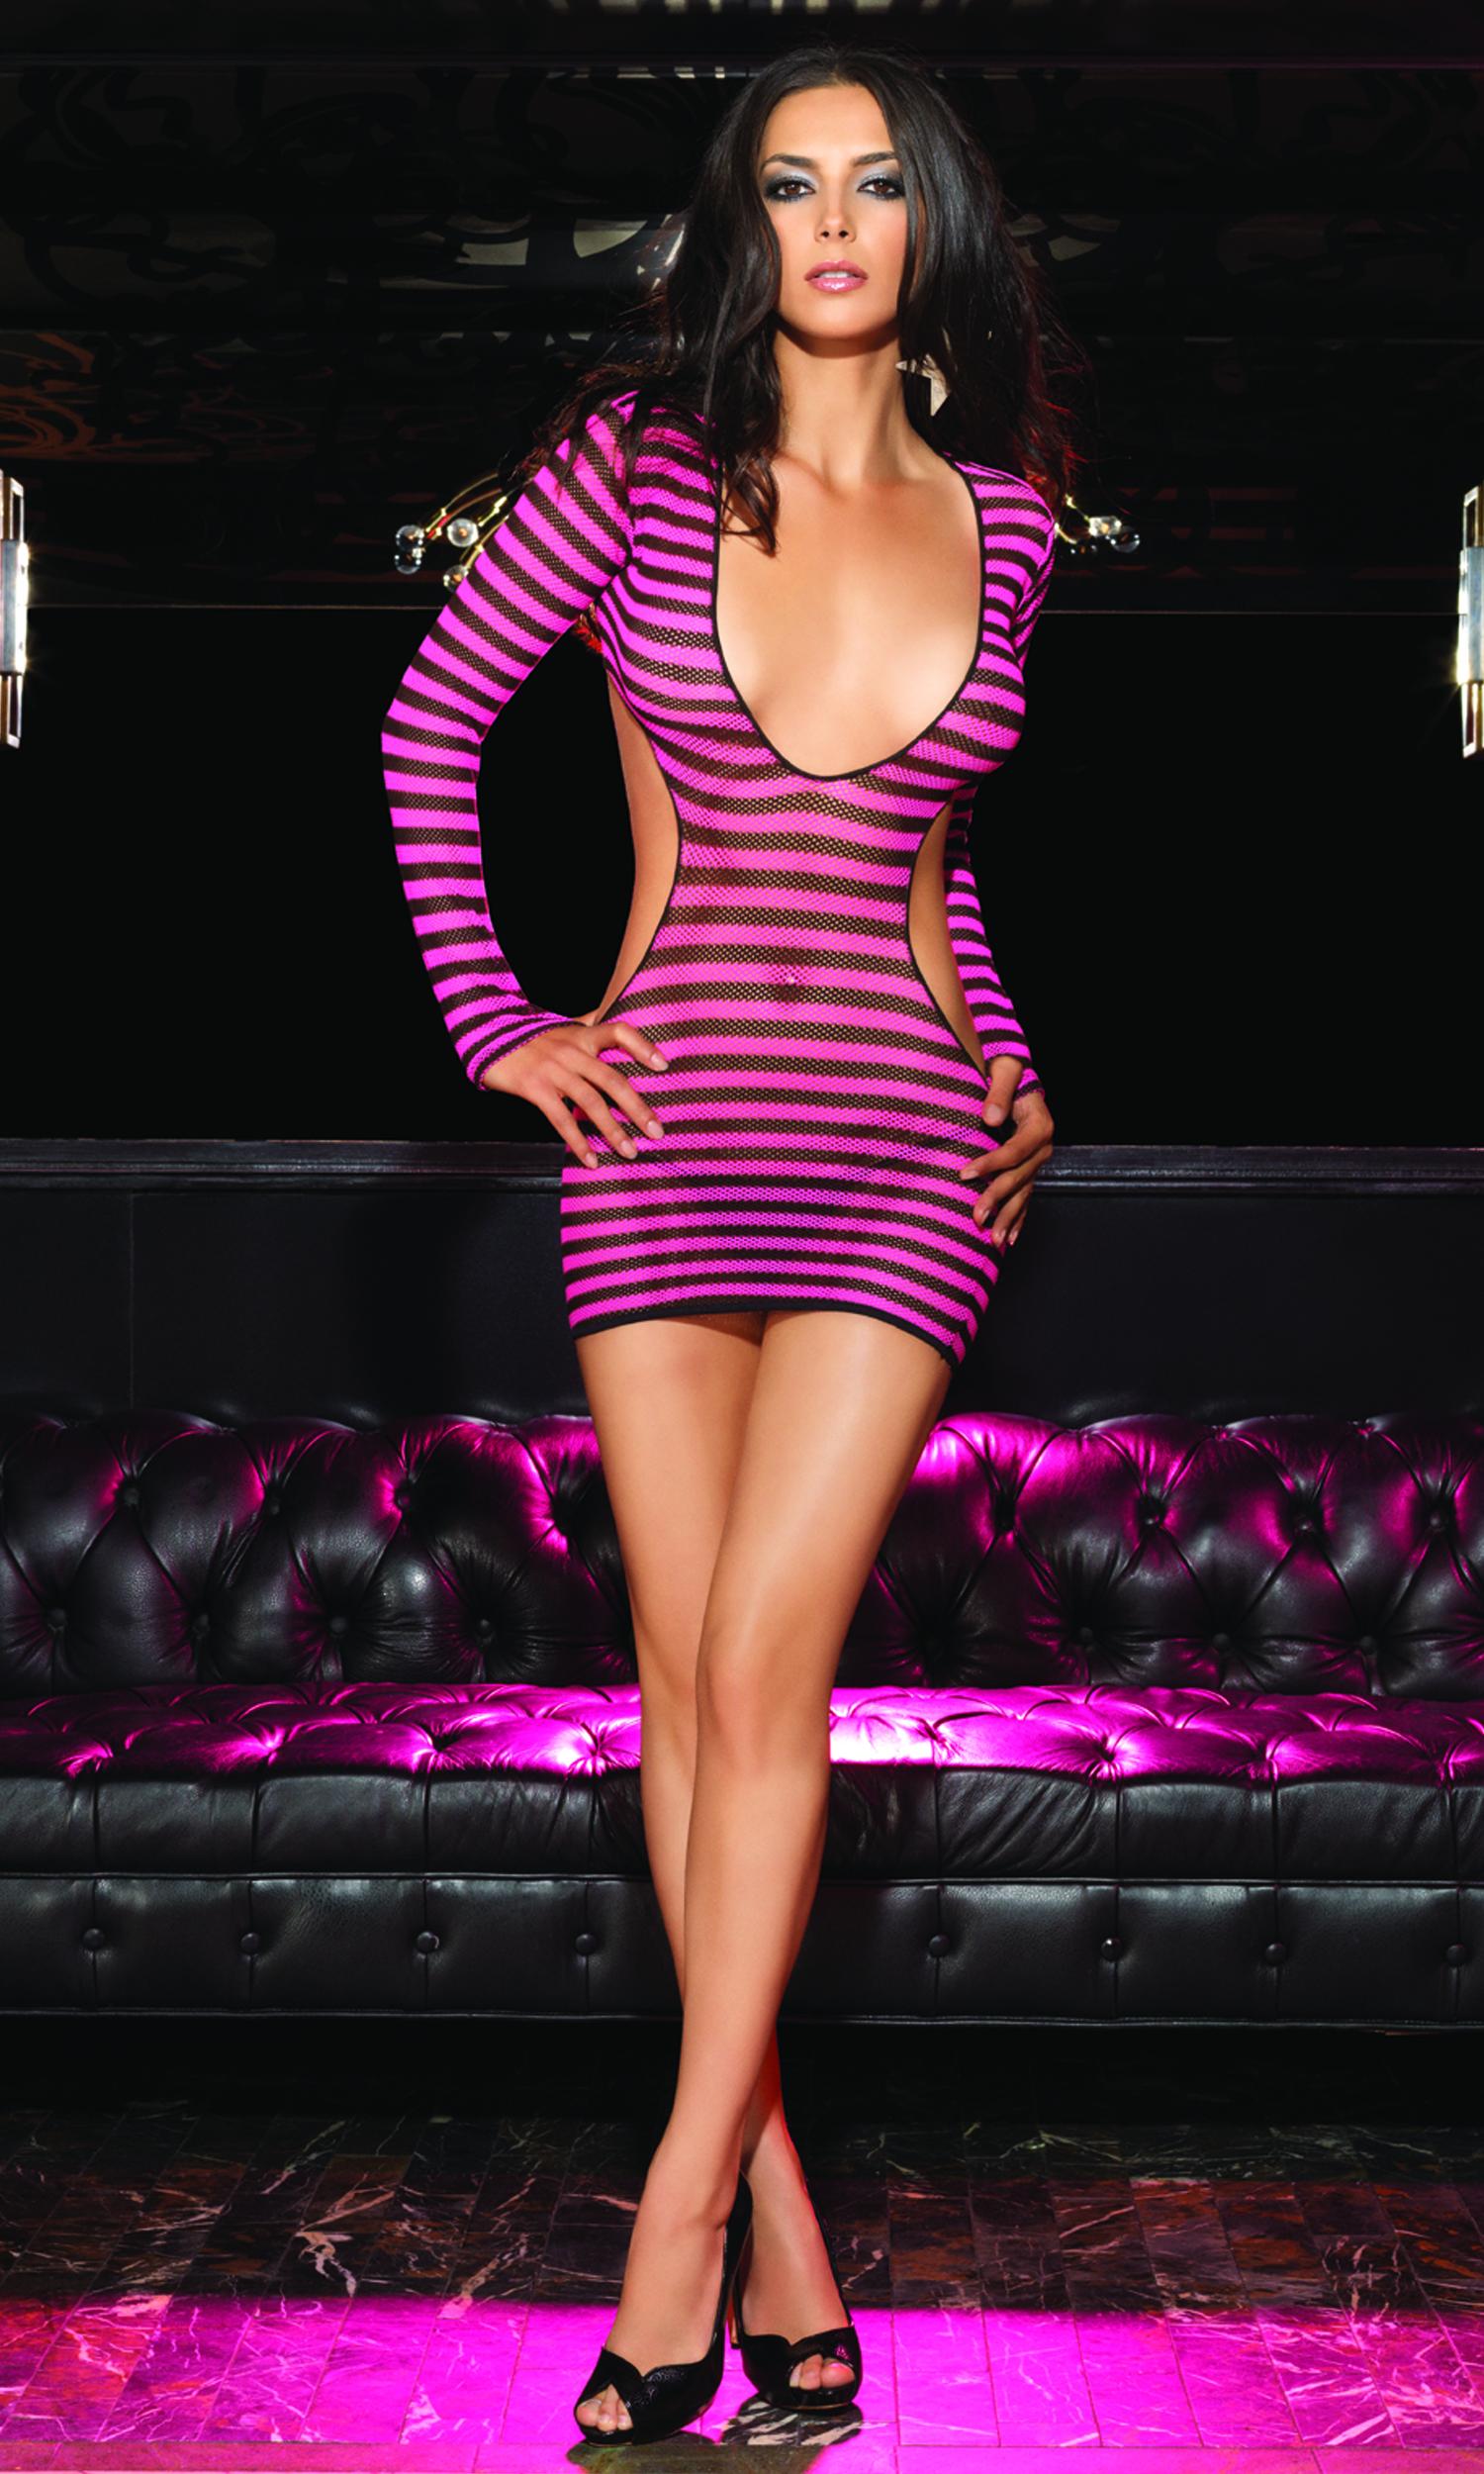 2pc Striped Fishnet Mini Dress With G String